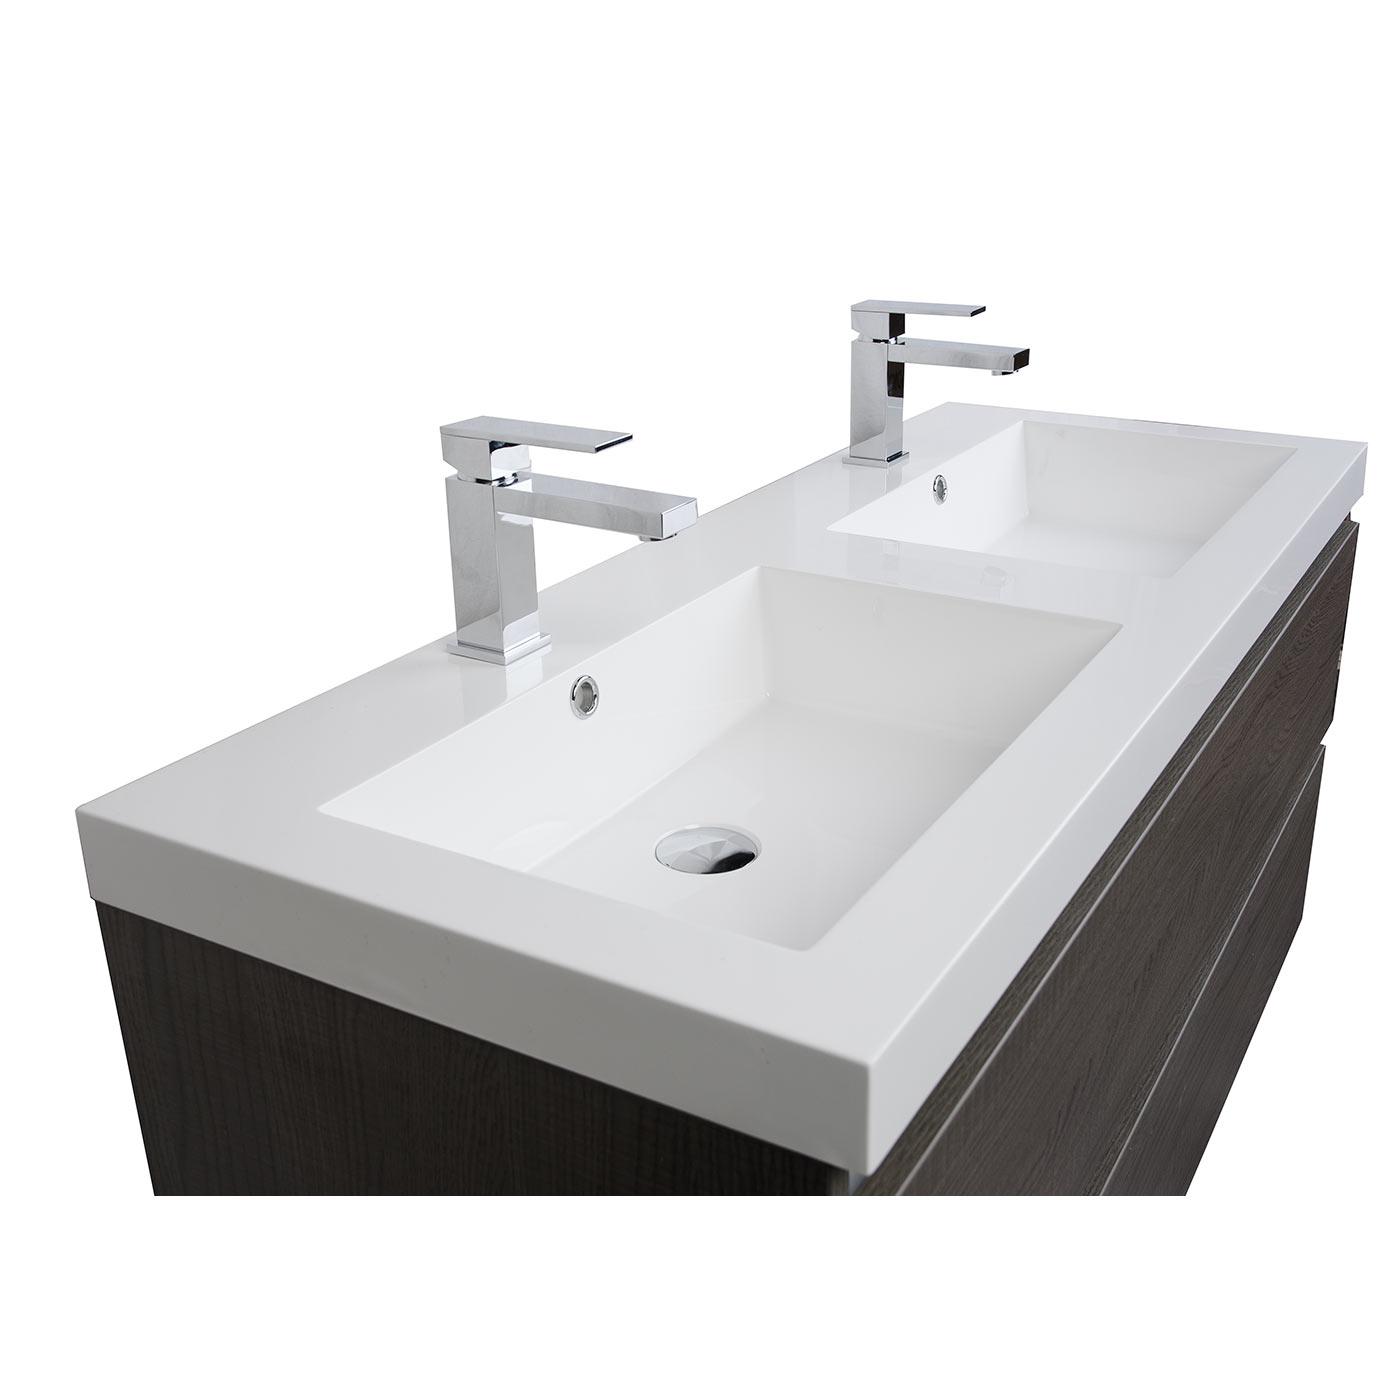 Buy Valencia 47 Inch Wall Mount Double Bathroom Vanity Set Grey Oak Optional Mirror Rs Dg1200 Oak On Conceptbaths Com Free Shipping